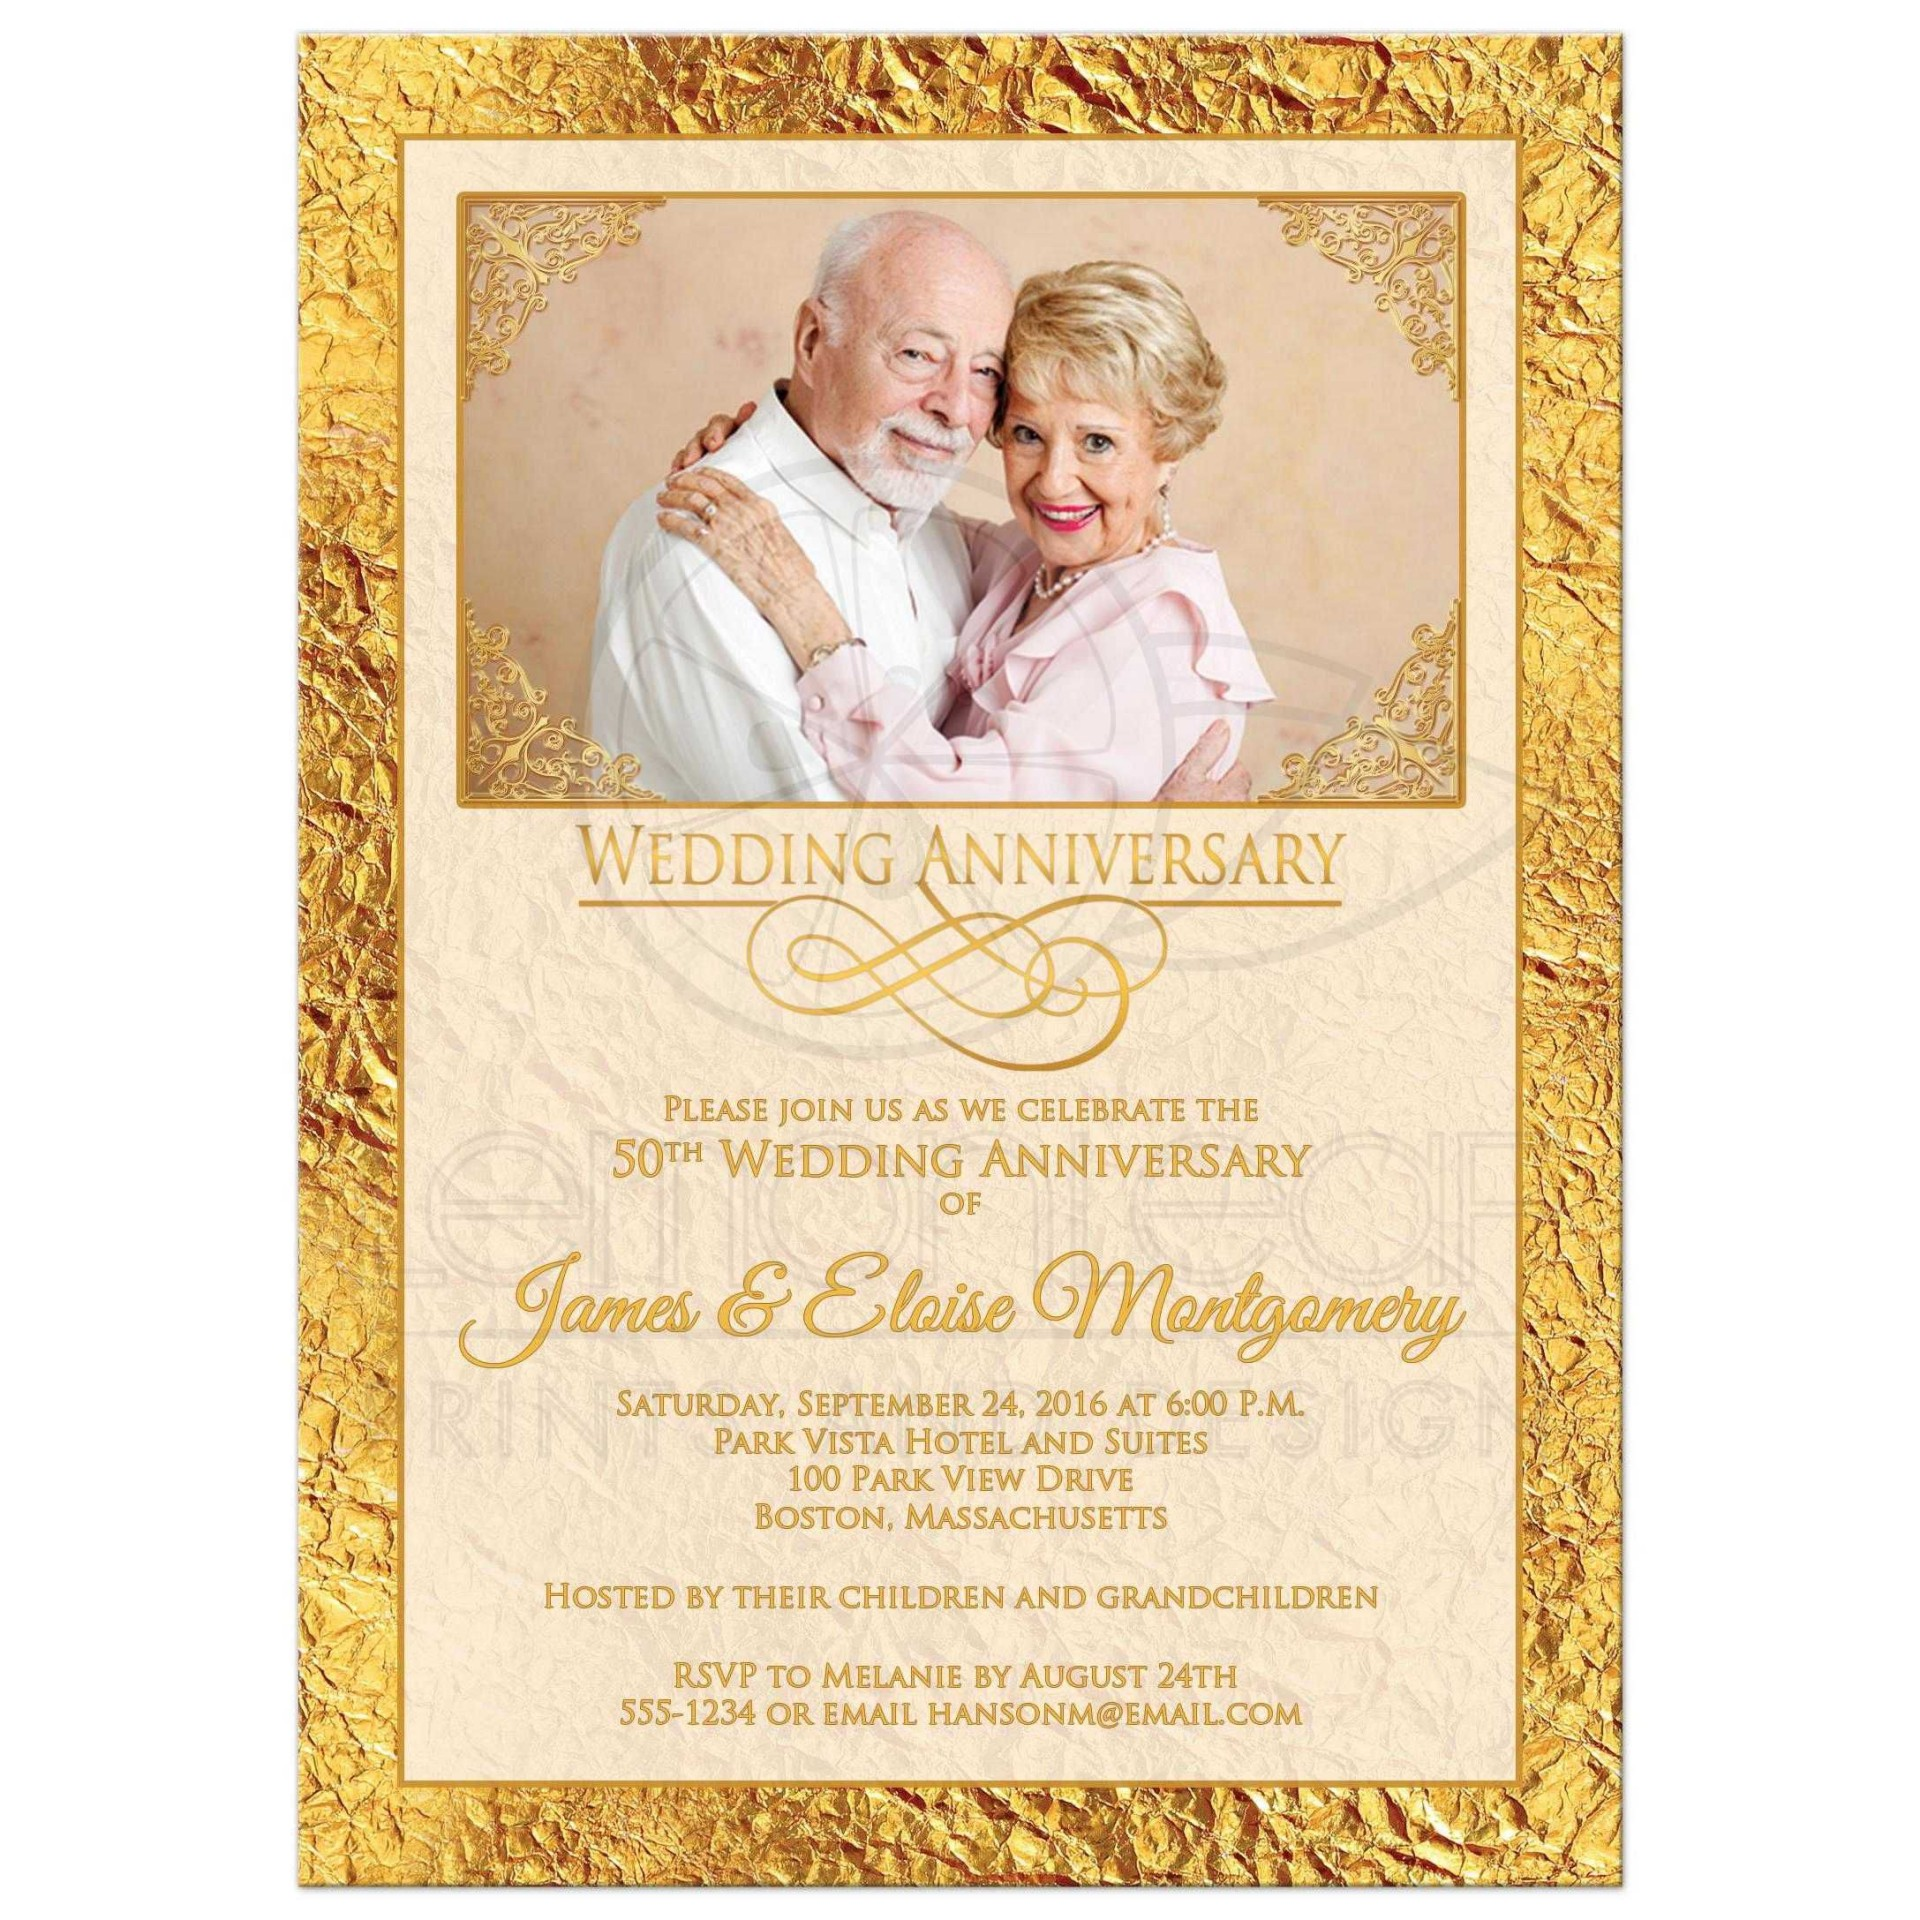 005 Wondrou 50th Anniversary Invitation Design High Definition  Designs Wedding Template Microsoft Word Surprise Party Wording Card Idea1920